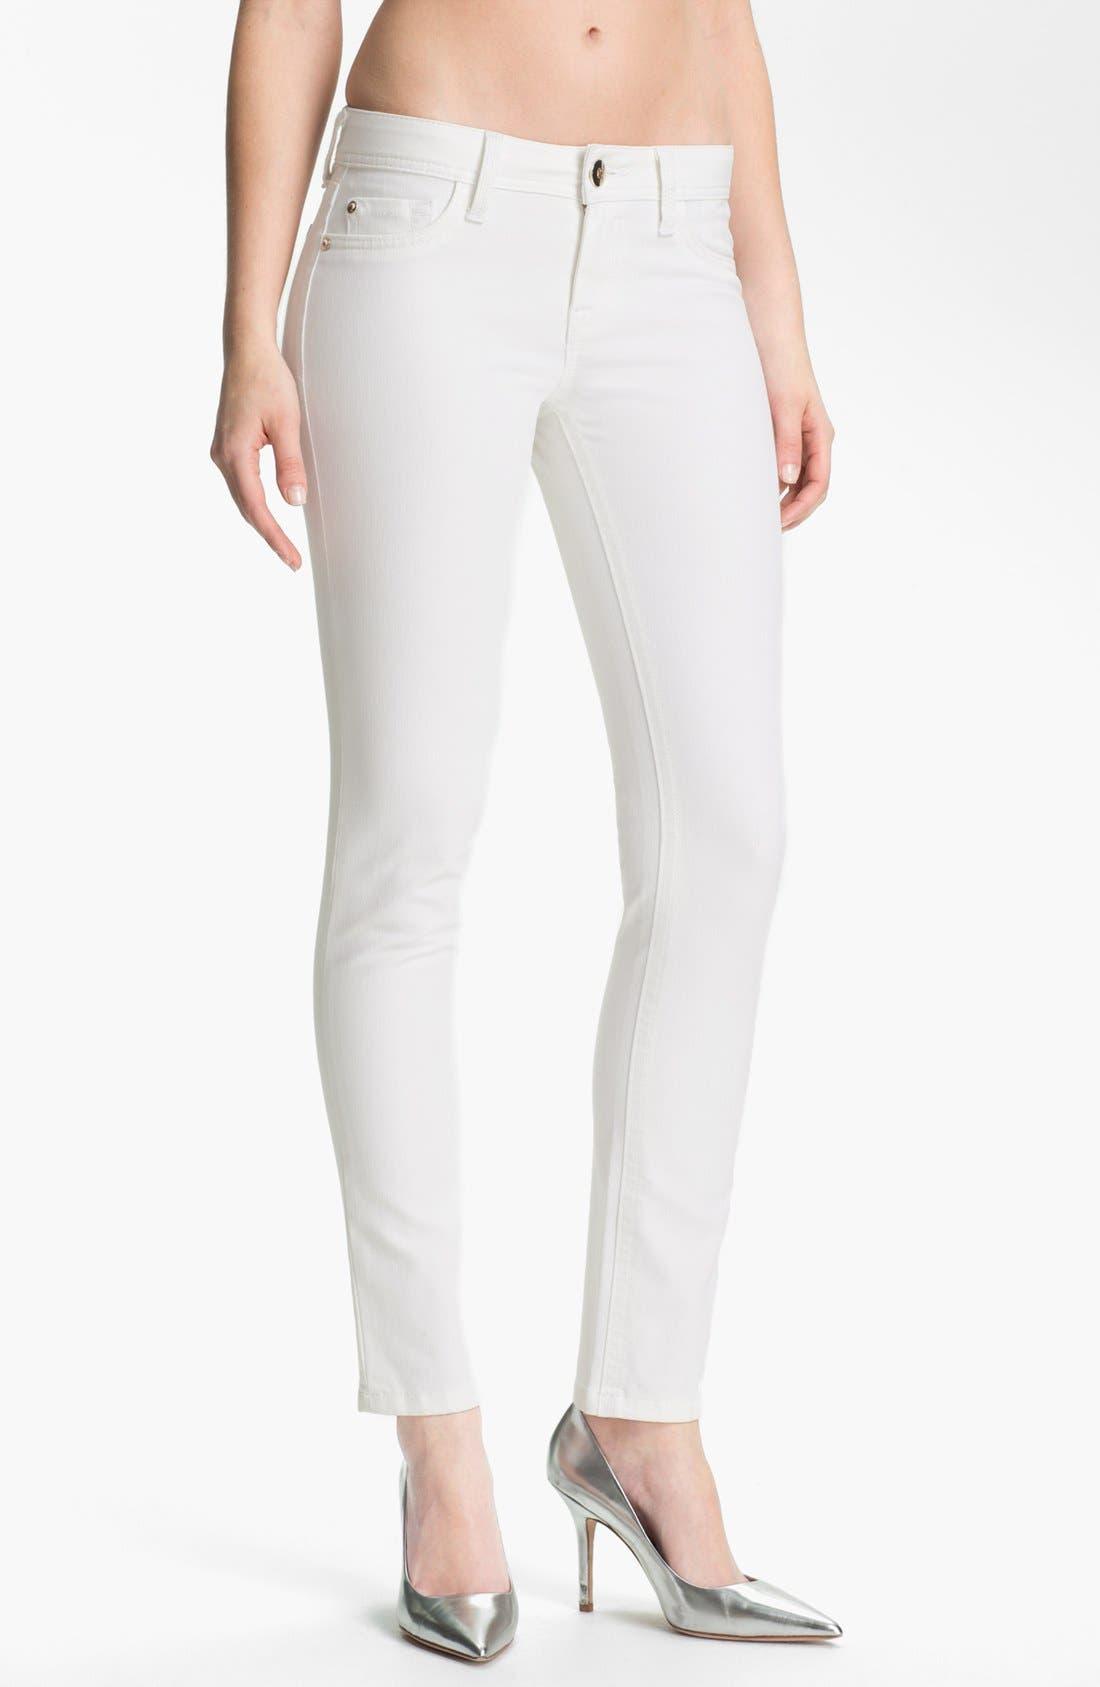 Main Image - DL1961 'Amanda' X-Fit Stretch Denim Skinny Jeans (Milk)